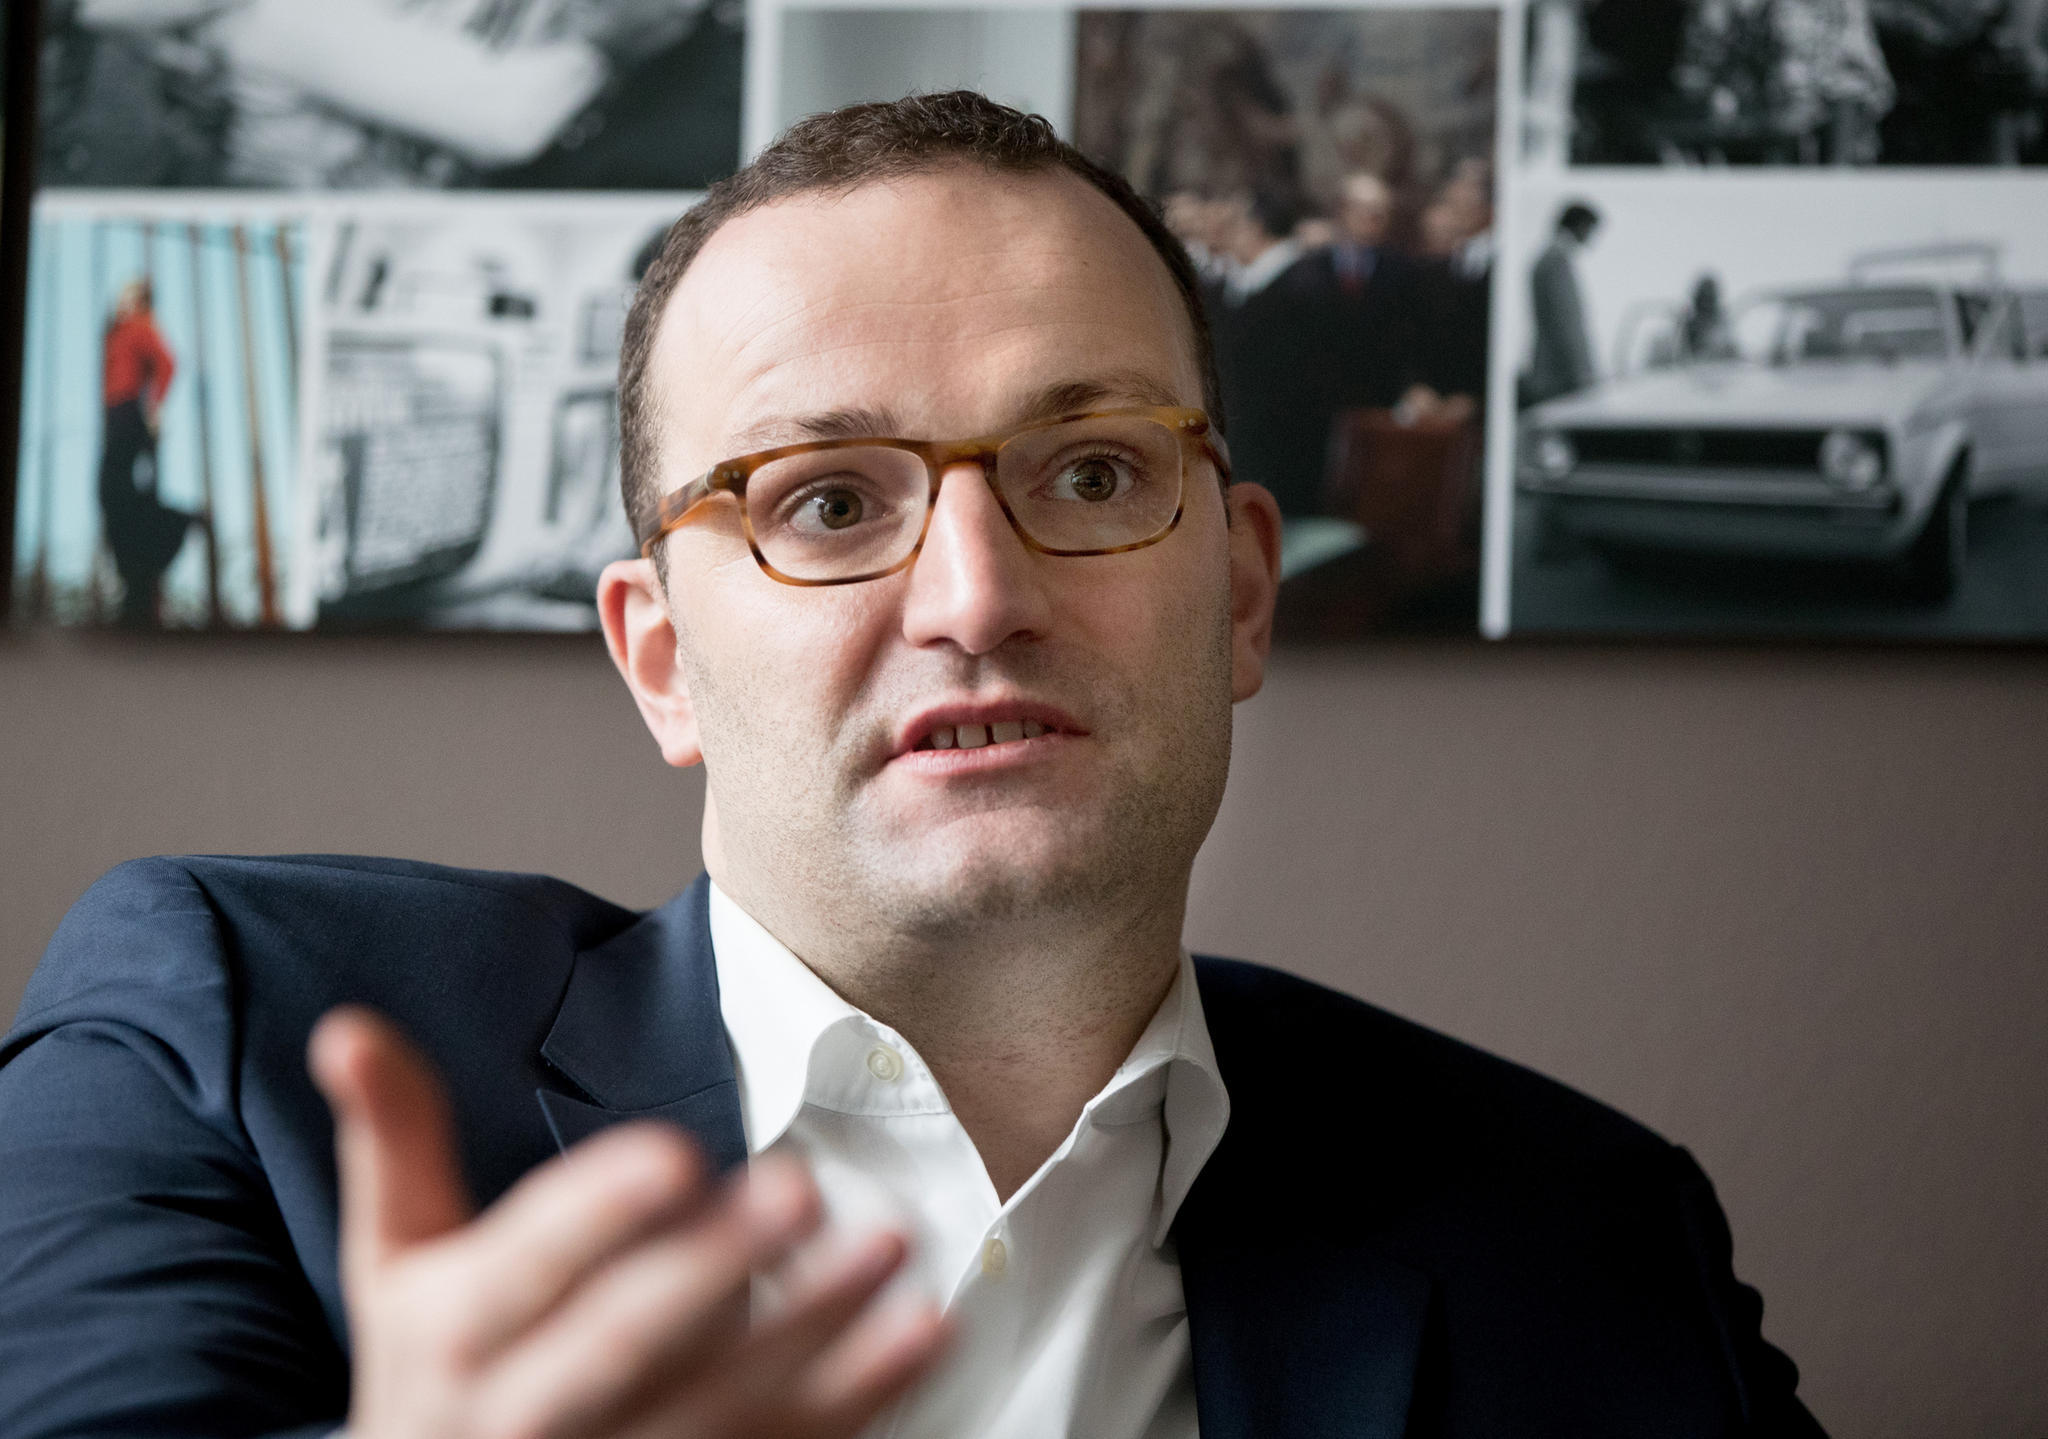 afghanistan zitat jens spahn - Jens Spahn Lebenslauf